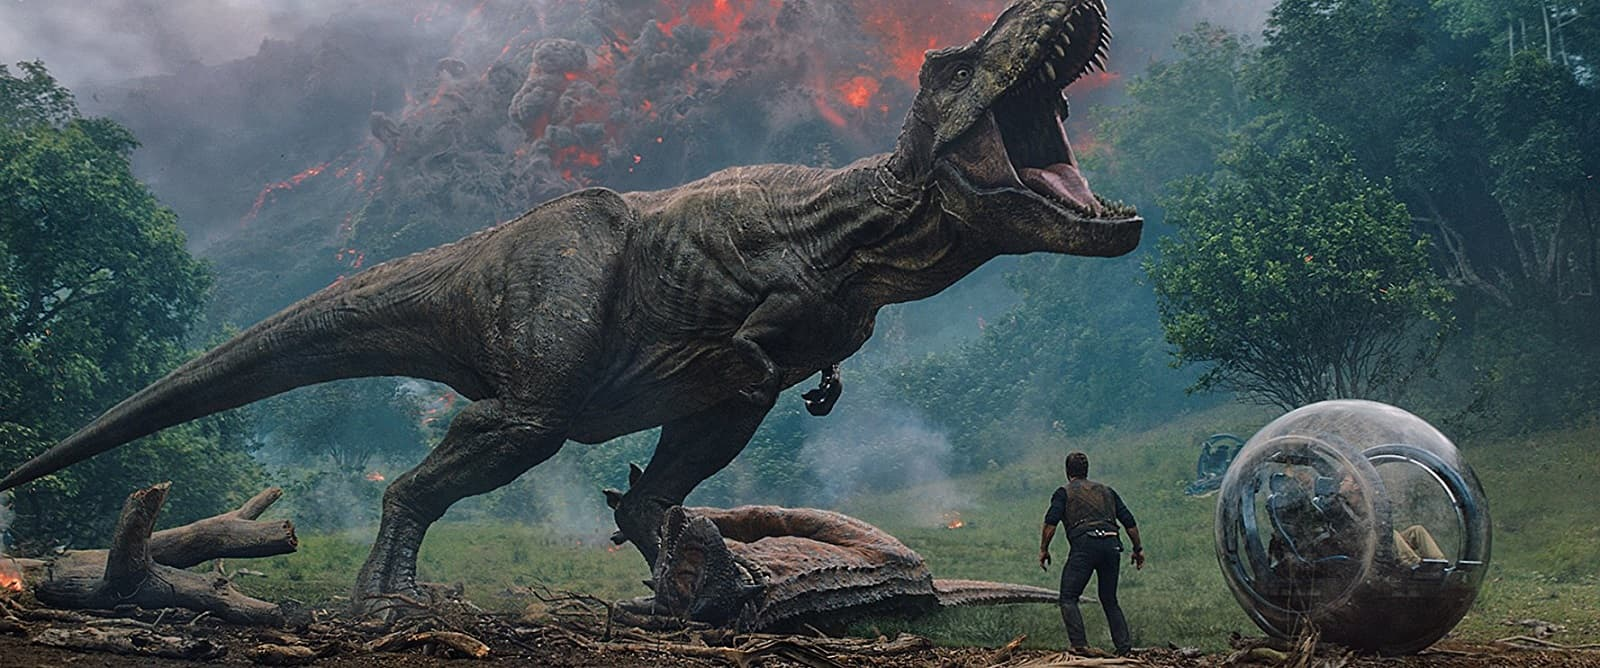 Мир Юрского периода 2, Мир Юрского периода, Фантастика, Рецензия, Обзор, Мнение, Отзыв, Jurassic World Fallen Kingdom, Jurassic World 2, Jurassic World, SciFi, Review